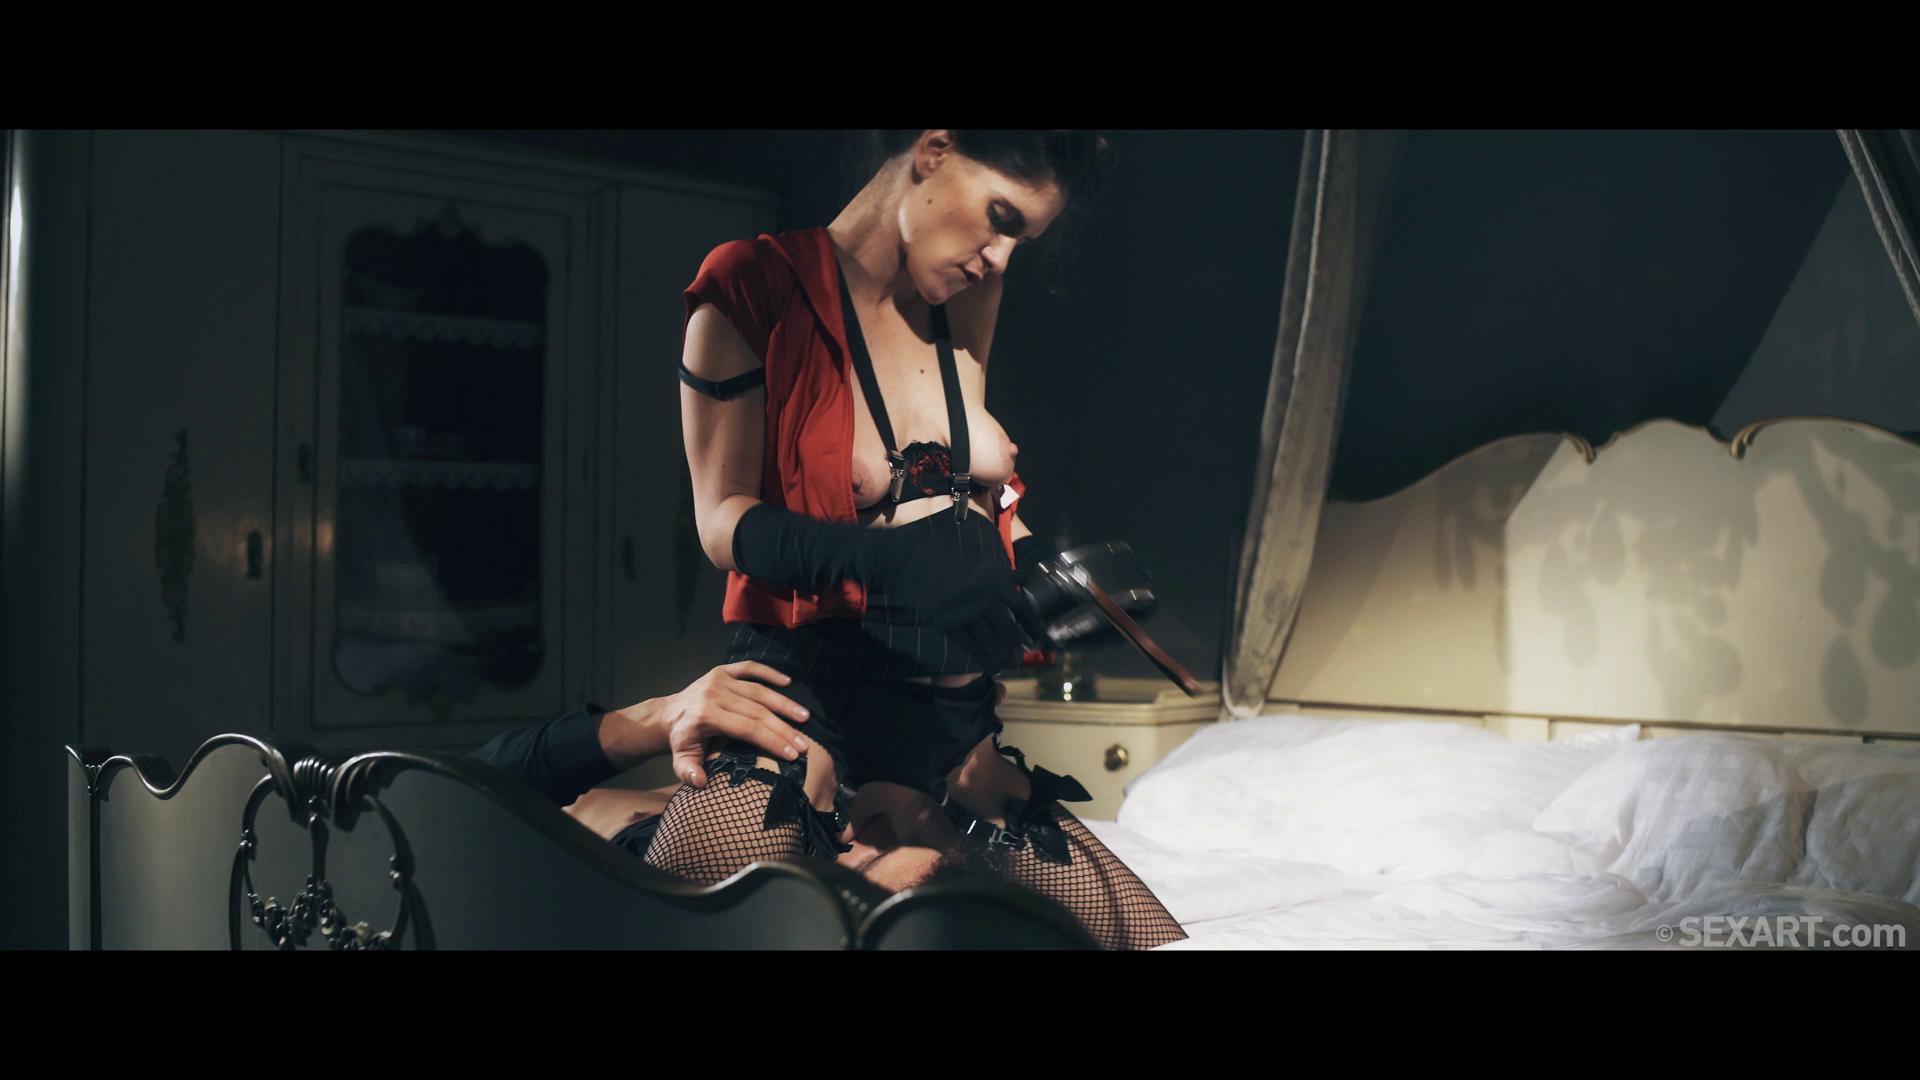 SexArt – Lana Seymour Studio 75